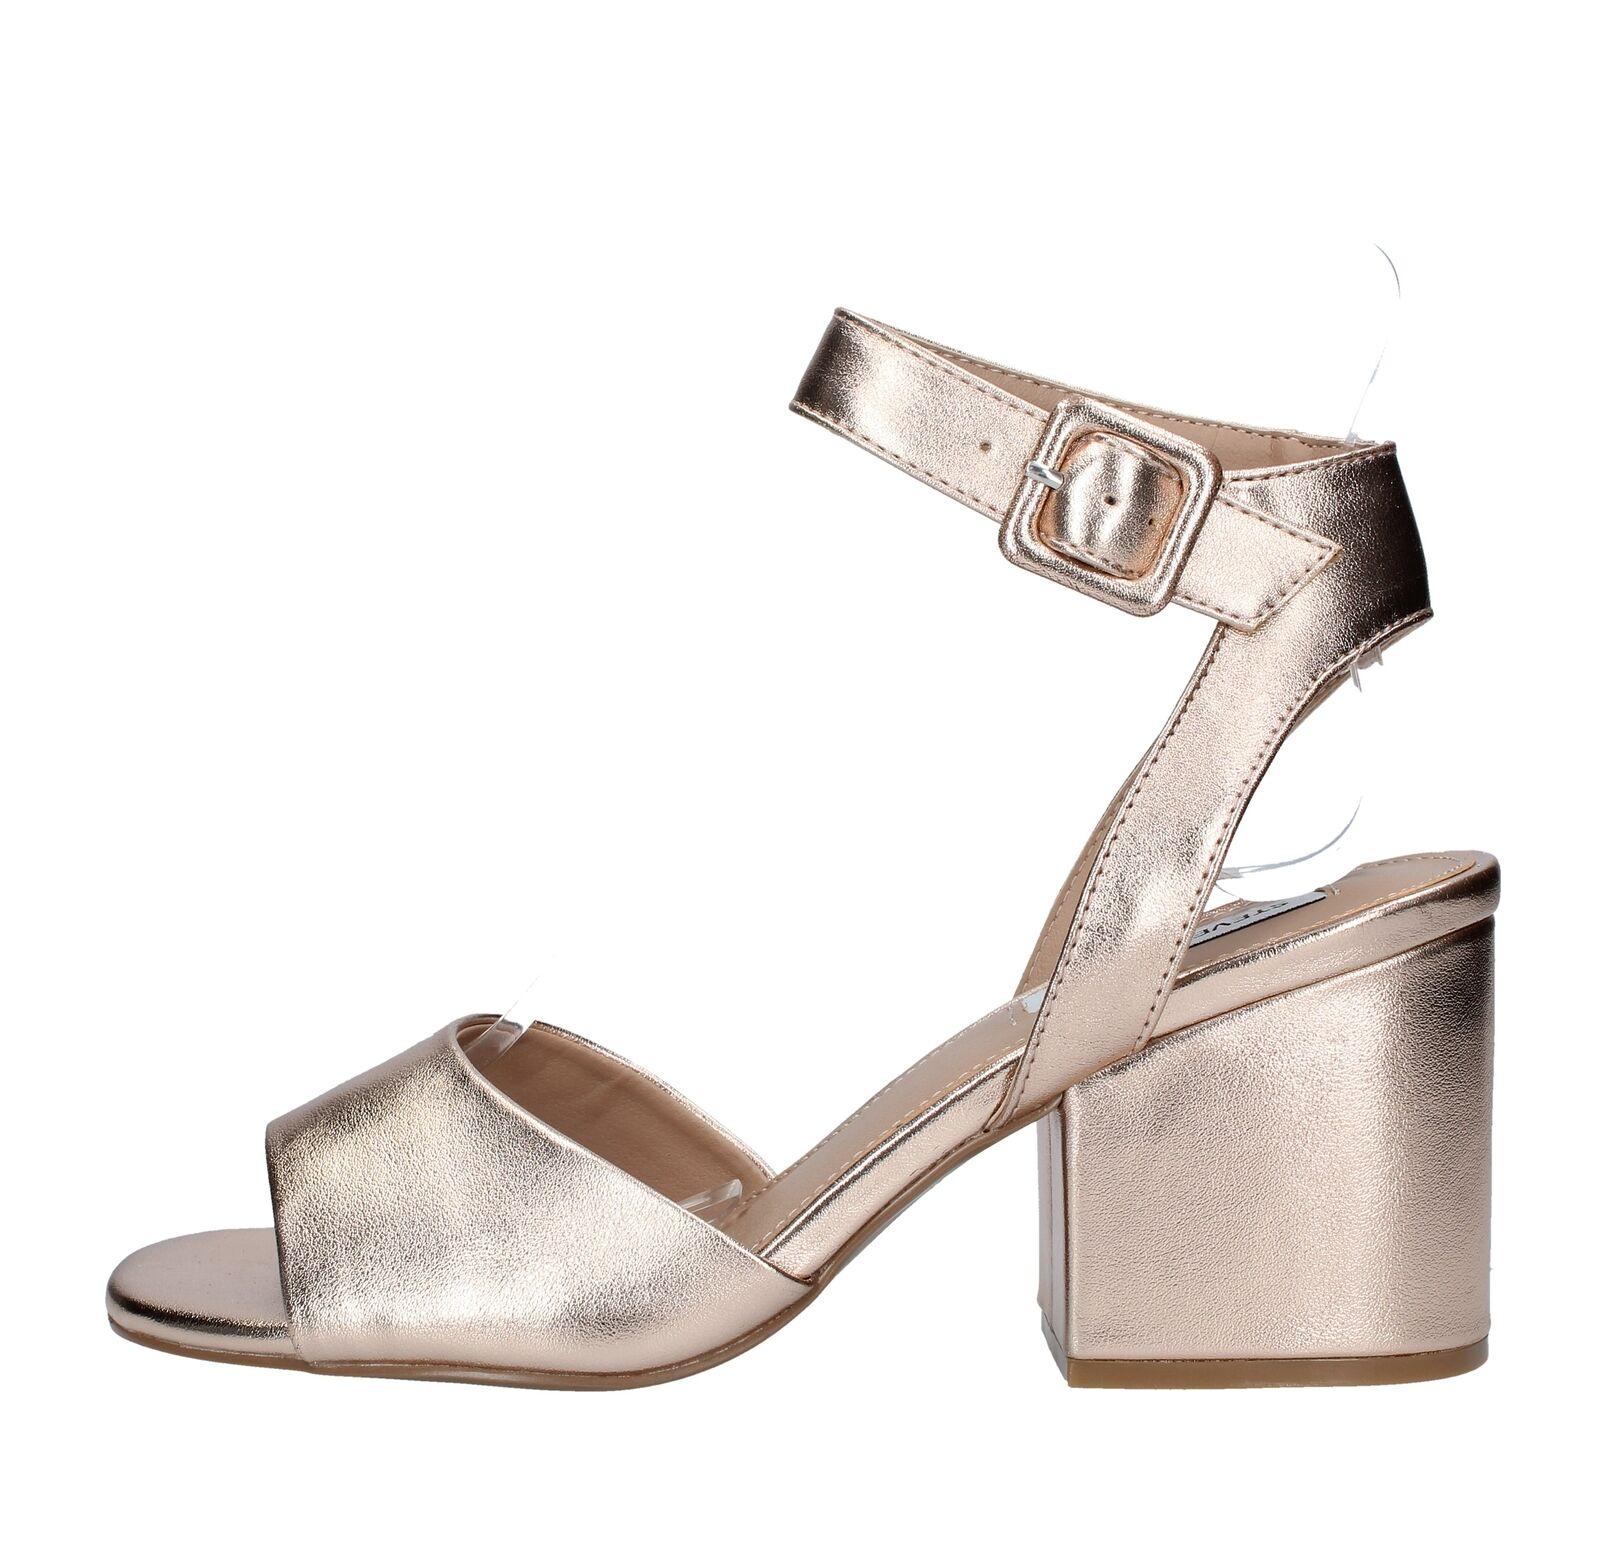 Amf4 _ stev shoes Sandals Steve Madden Woman Pink